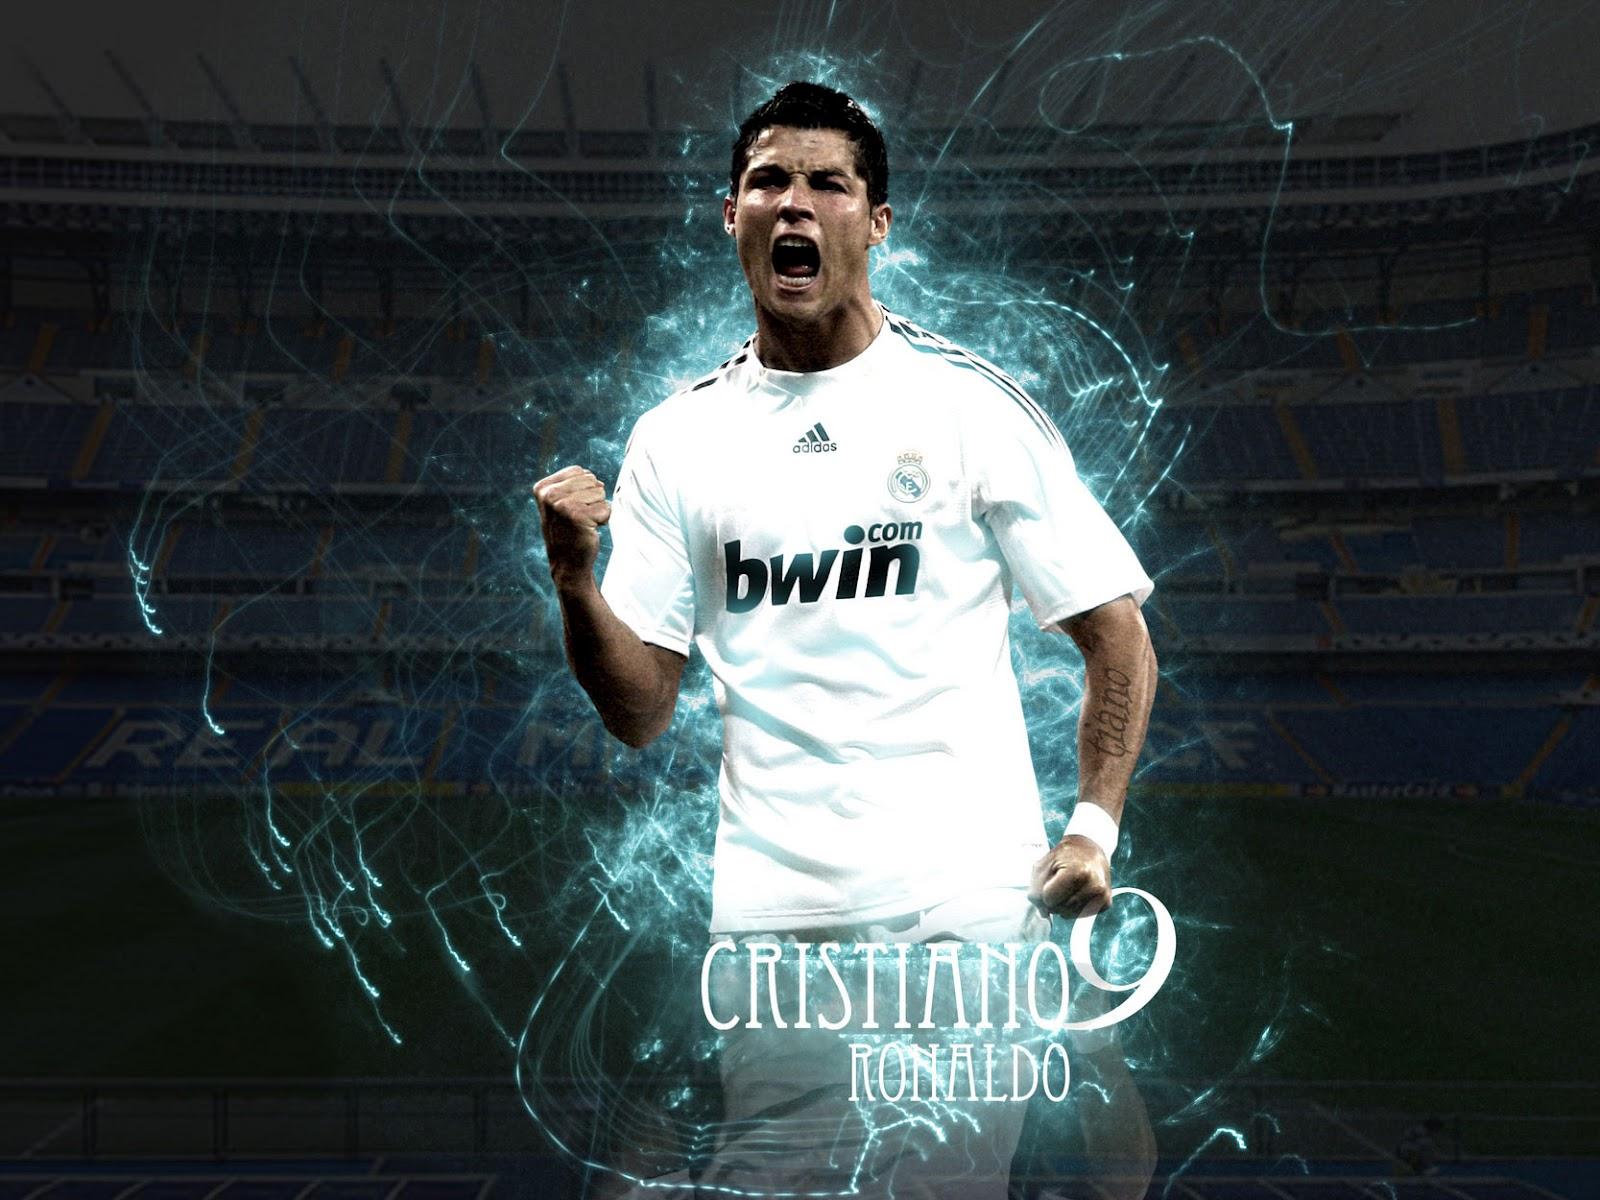 http://4.bp.blogspot.com/-1OtEaC3QZds/UBPdkGOmkqI/AAAAAAAAKvM/FGxxaYezraU/s1600/1024x768_Cristiano_Ronaldo146_07.jpg